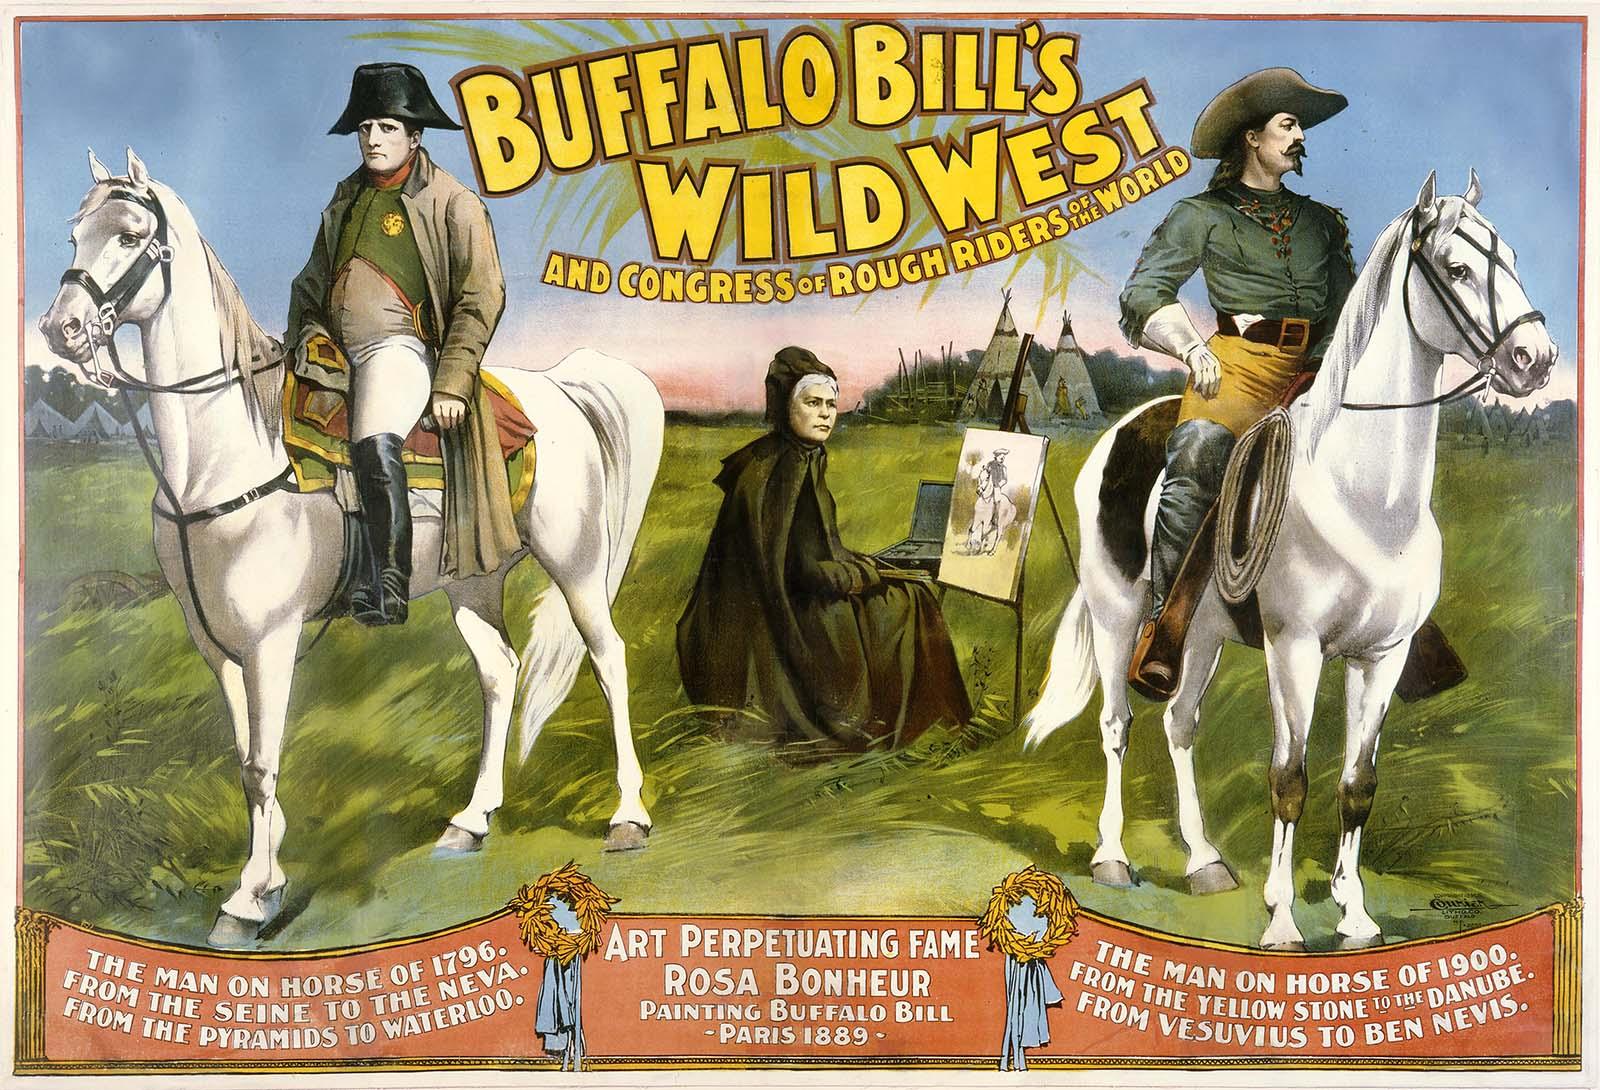 Wild West poster by Courier Litho Co., Buffalo, NY, 1896, featuring Napoleon, Rosa Bonheur, and Buffalo Bill. Gift of Dr. Tony Sapienza, Ridgewood, NJ. 1.69.5655